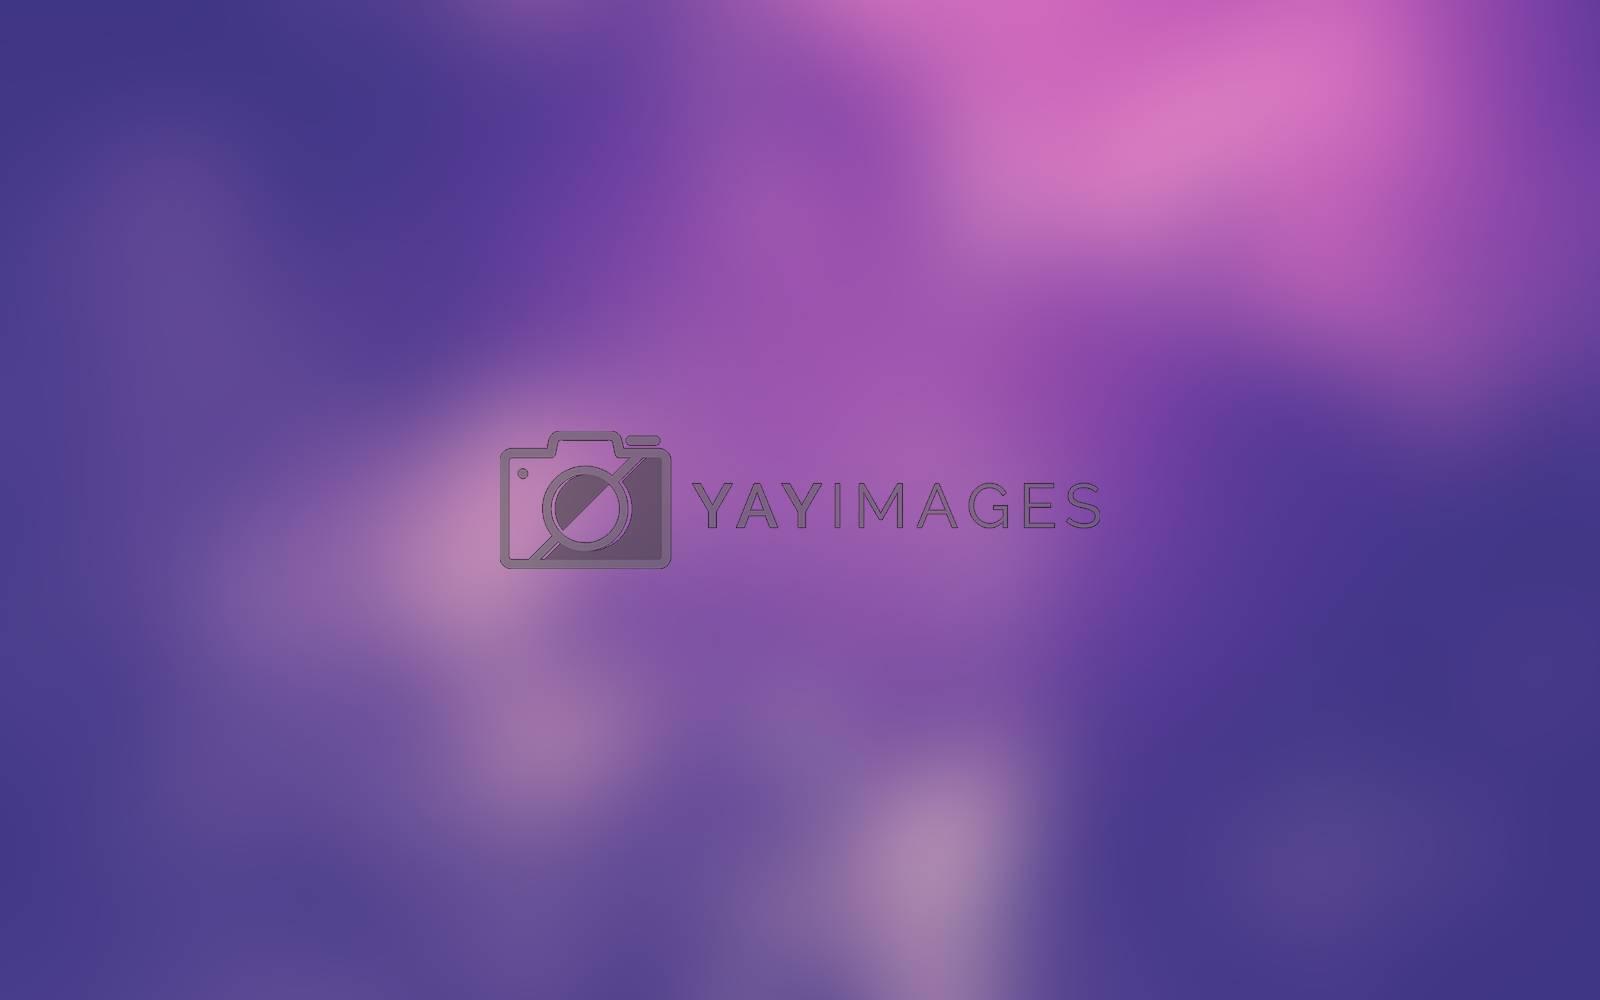 Colorful abstract defocused blur background.  by Teerawit Tj-rabbit